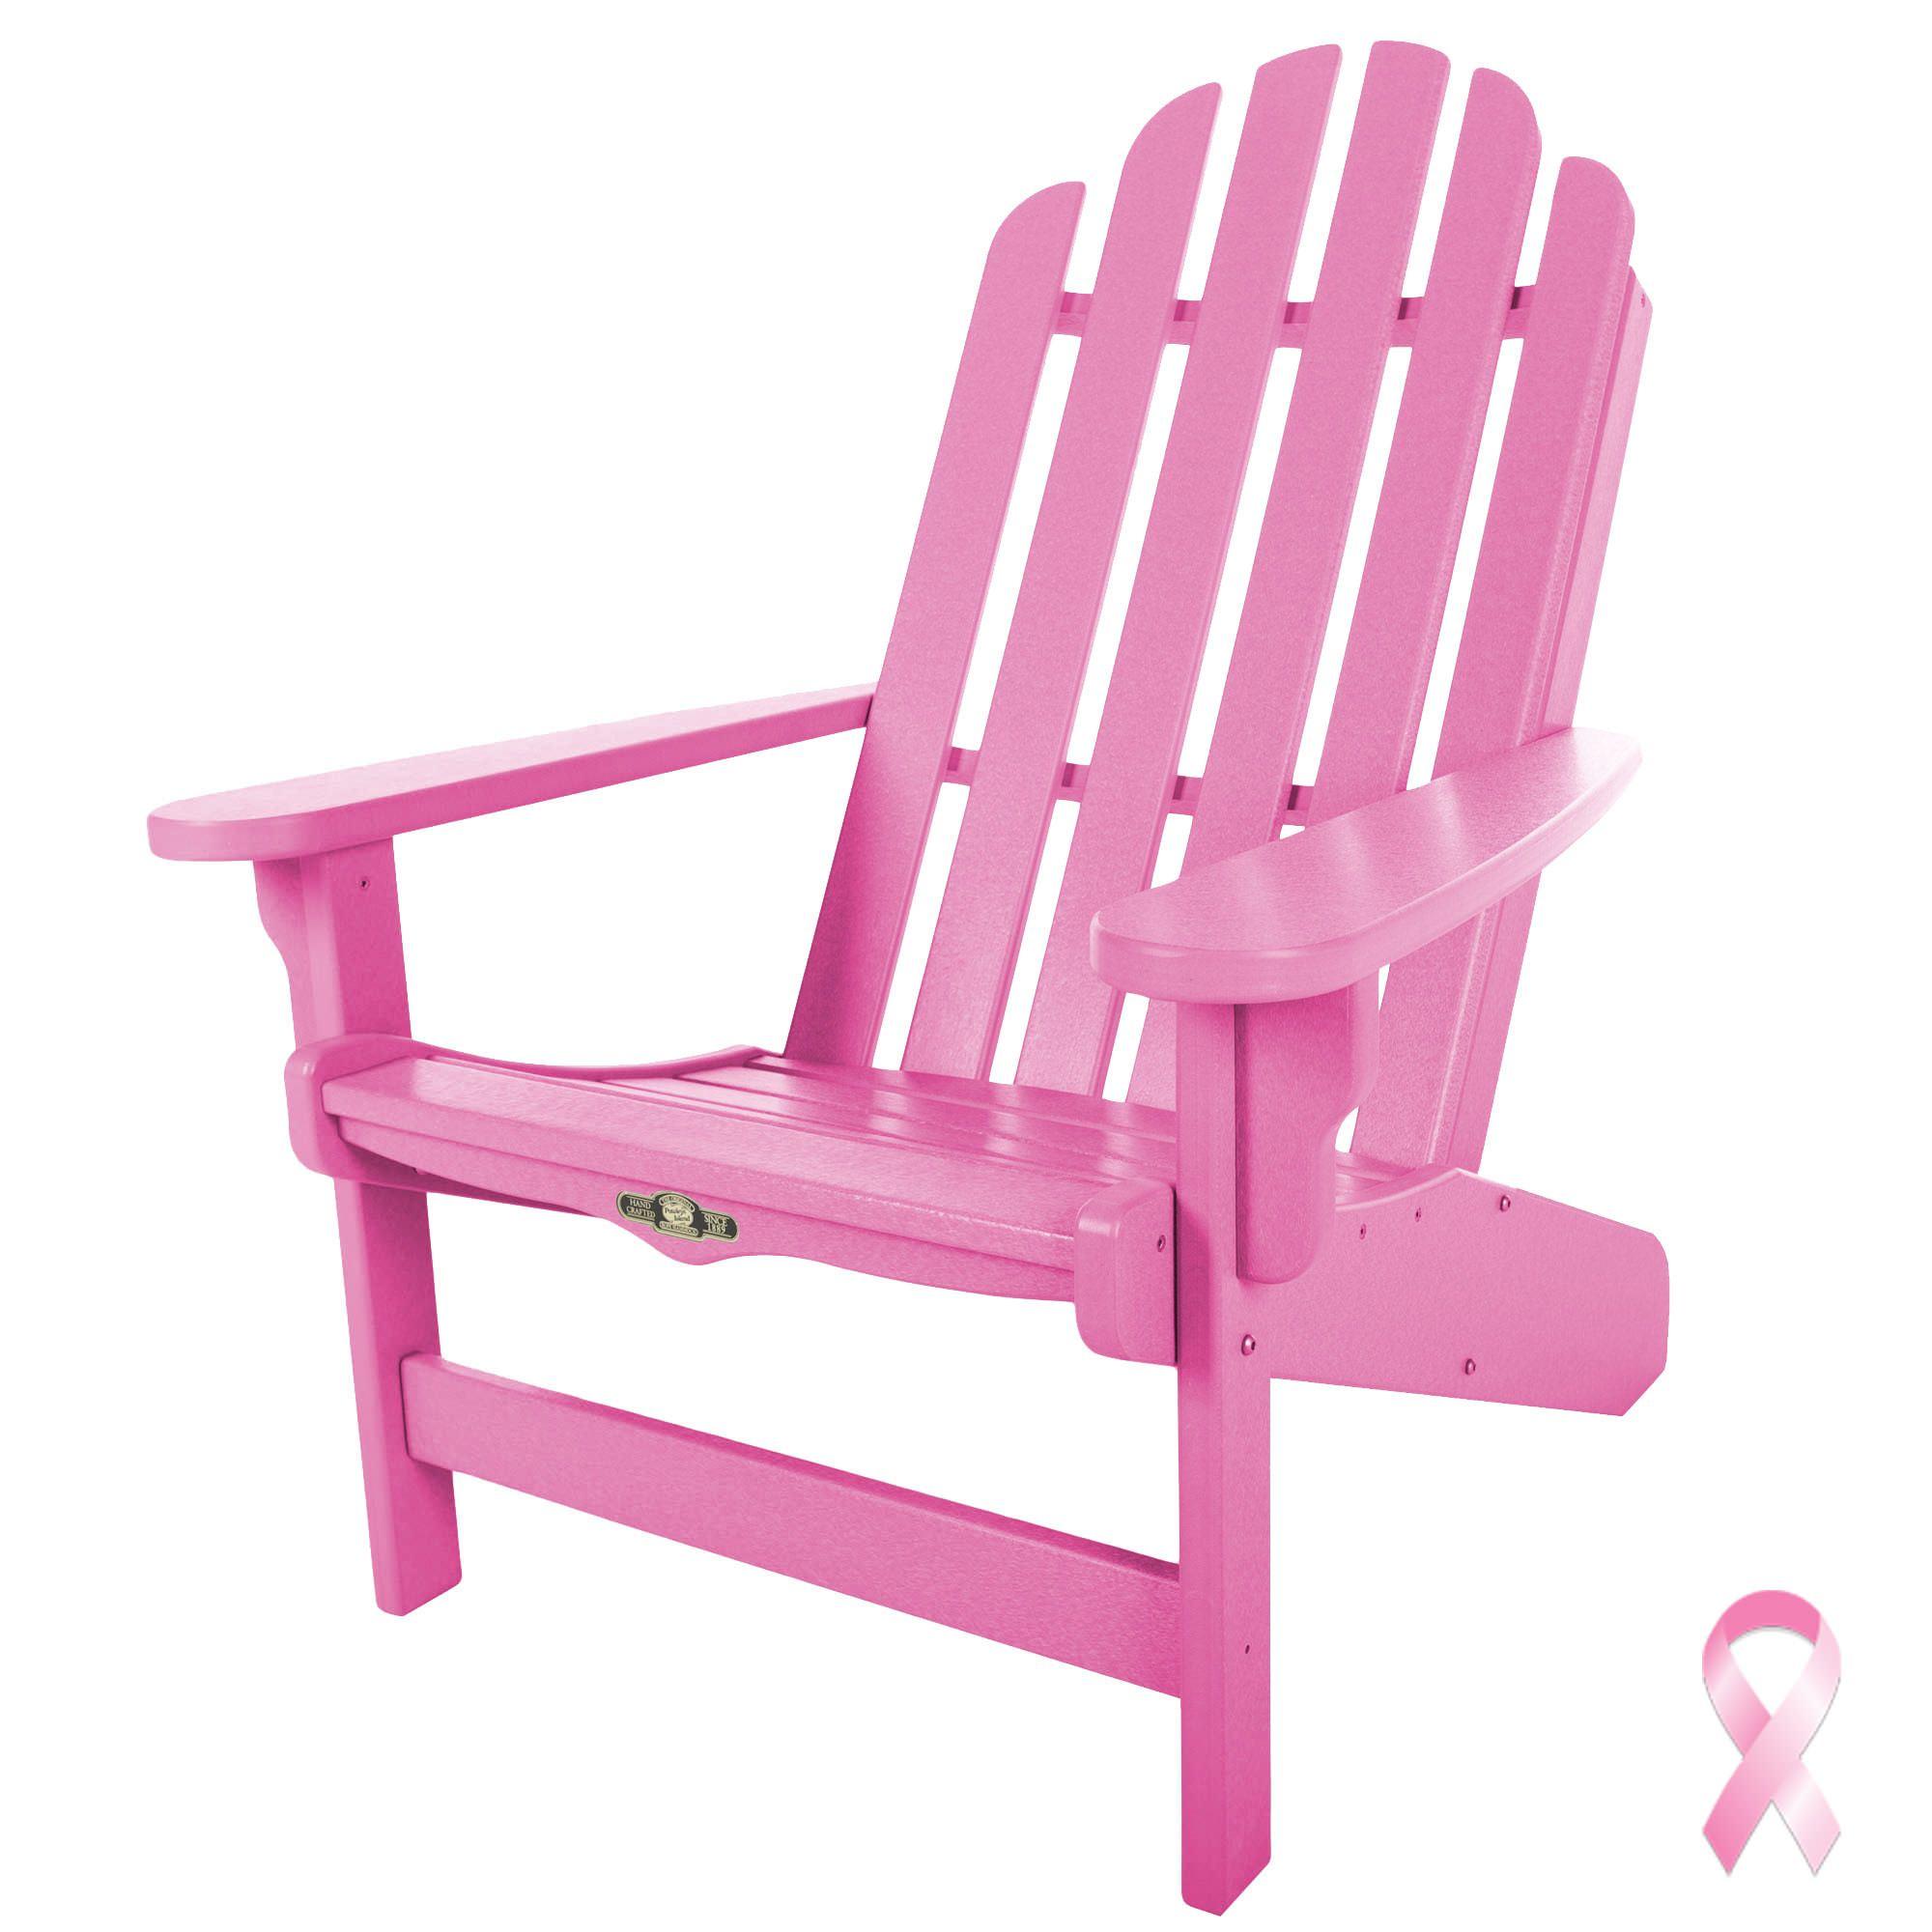 Adirondack Chairs Plastic Cr Plastic Stratford Chair Chair